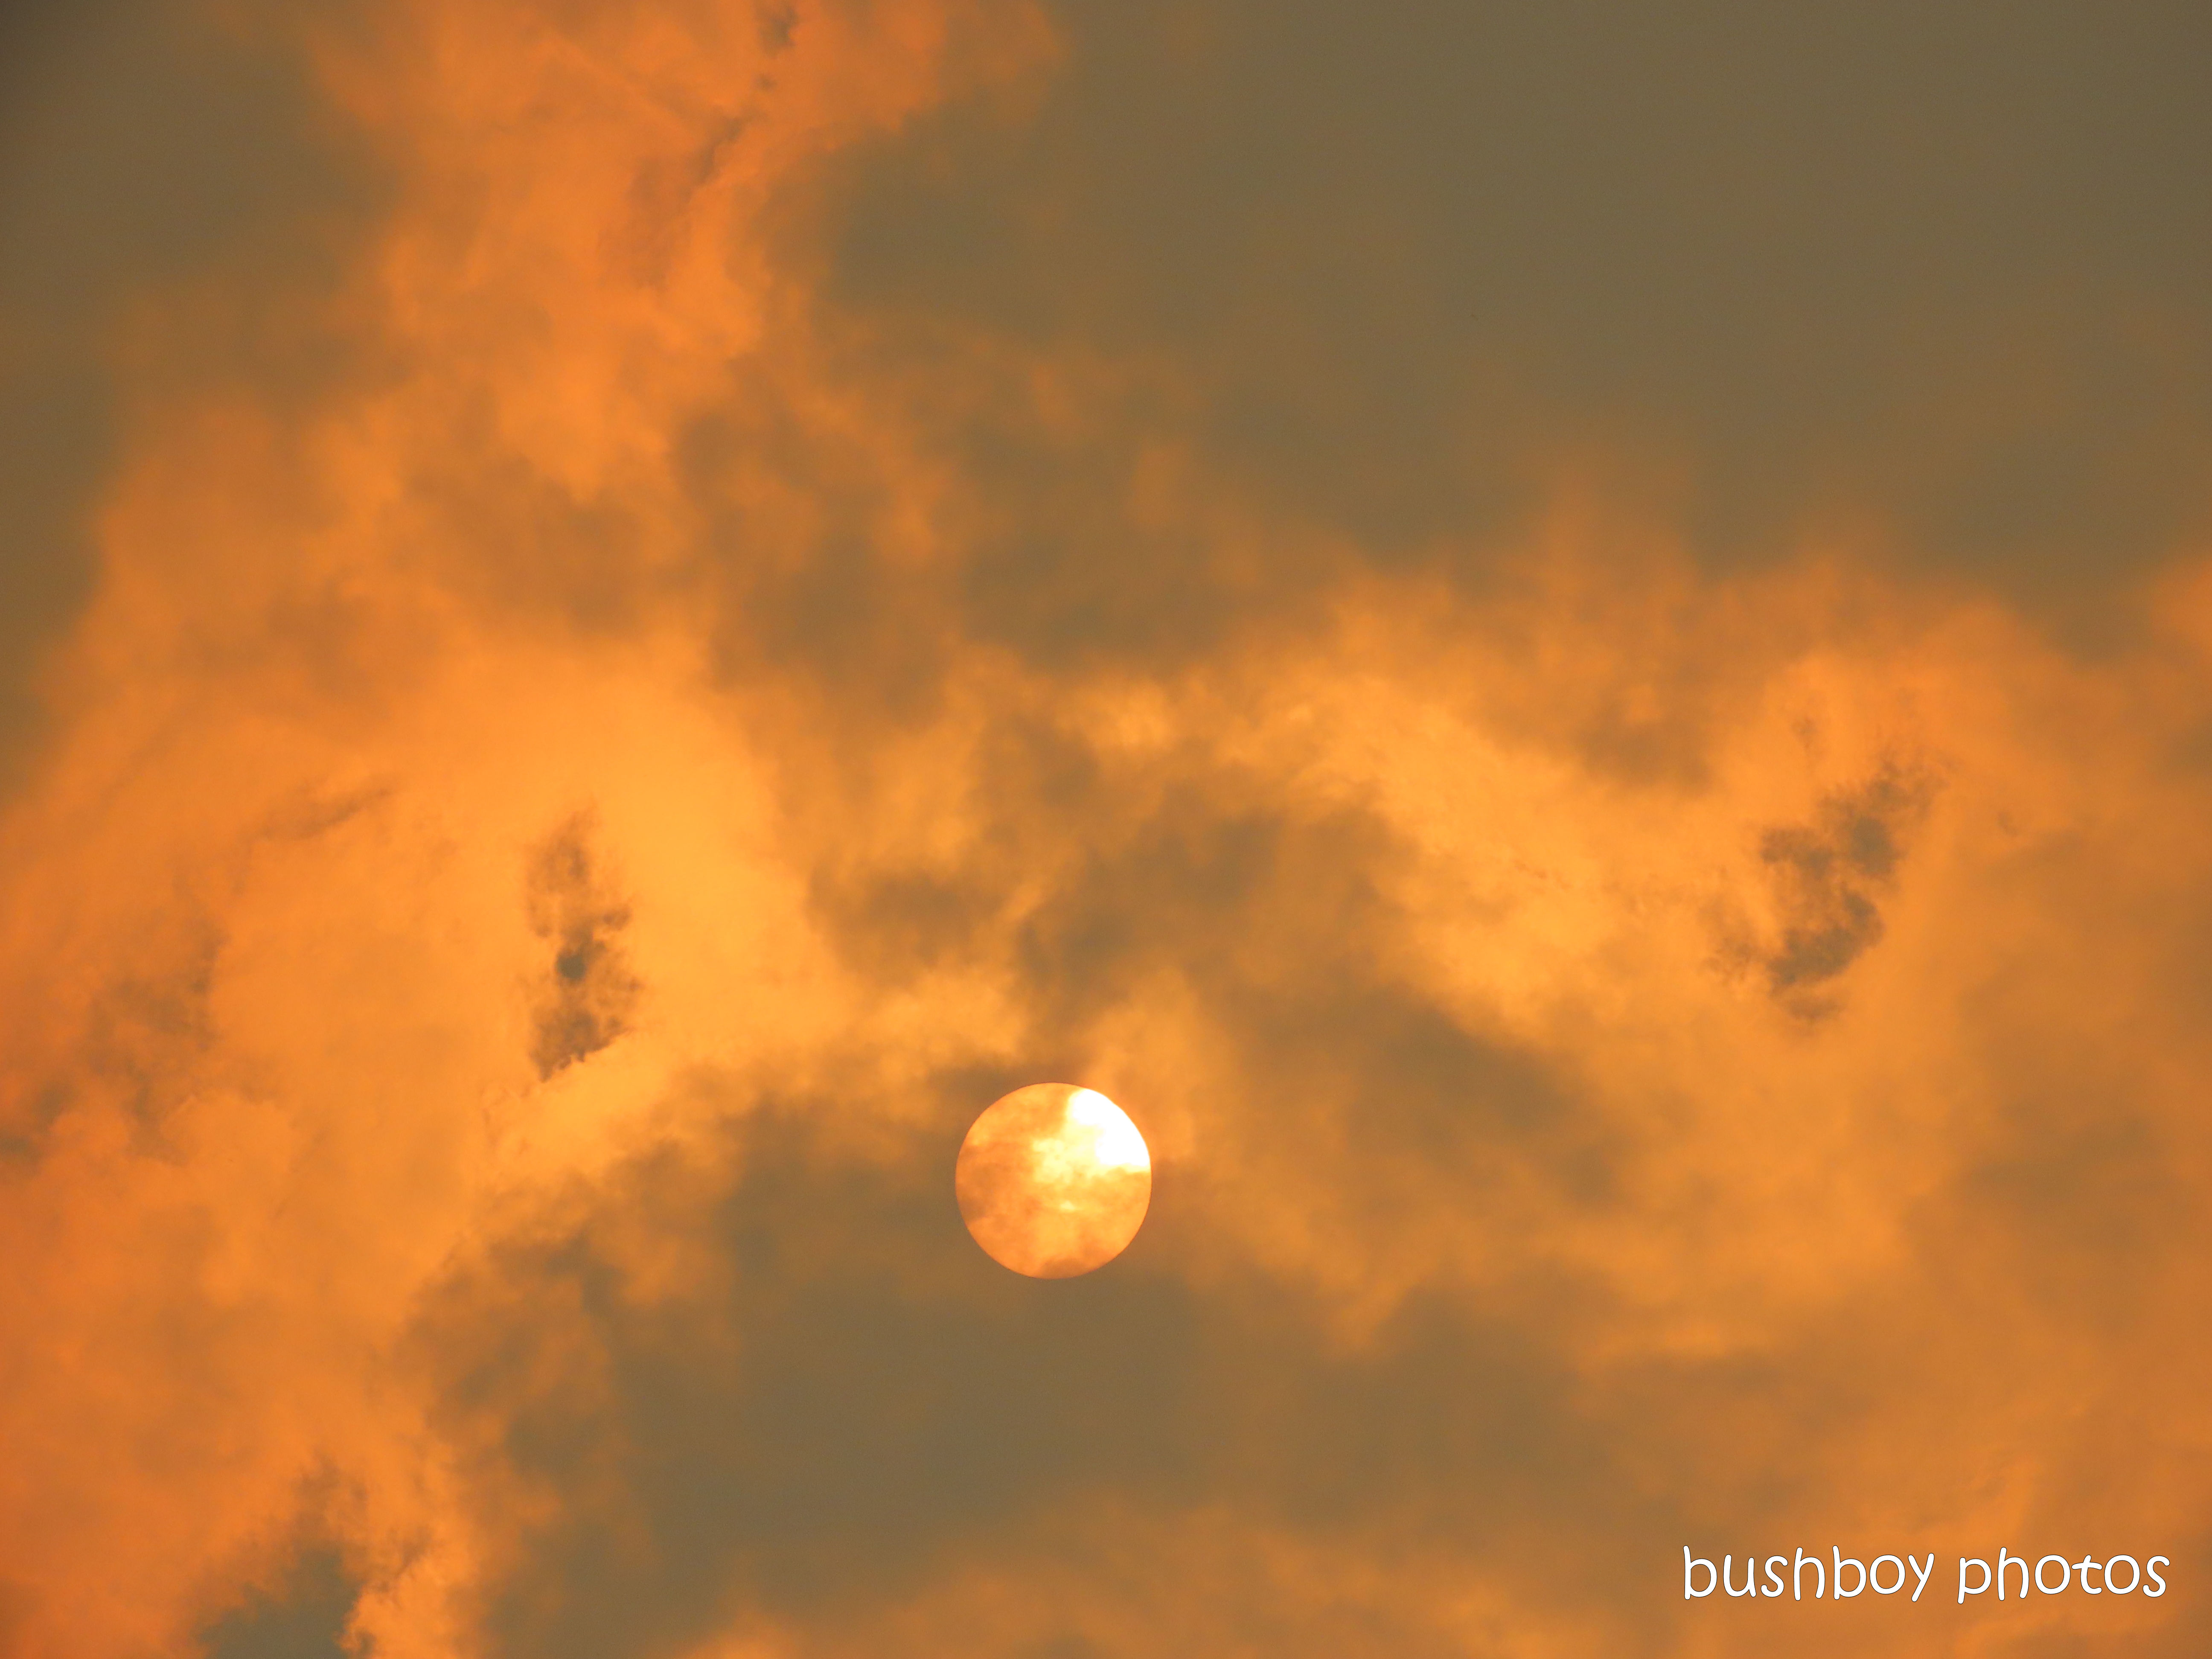 sun1_clouds_smoke_fire_named_home_jackadgery_oct 2019